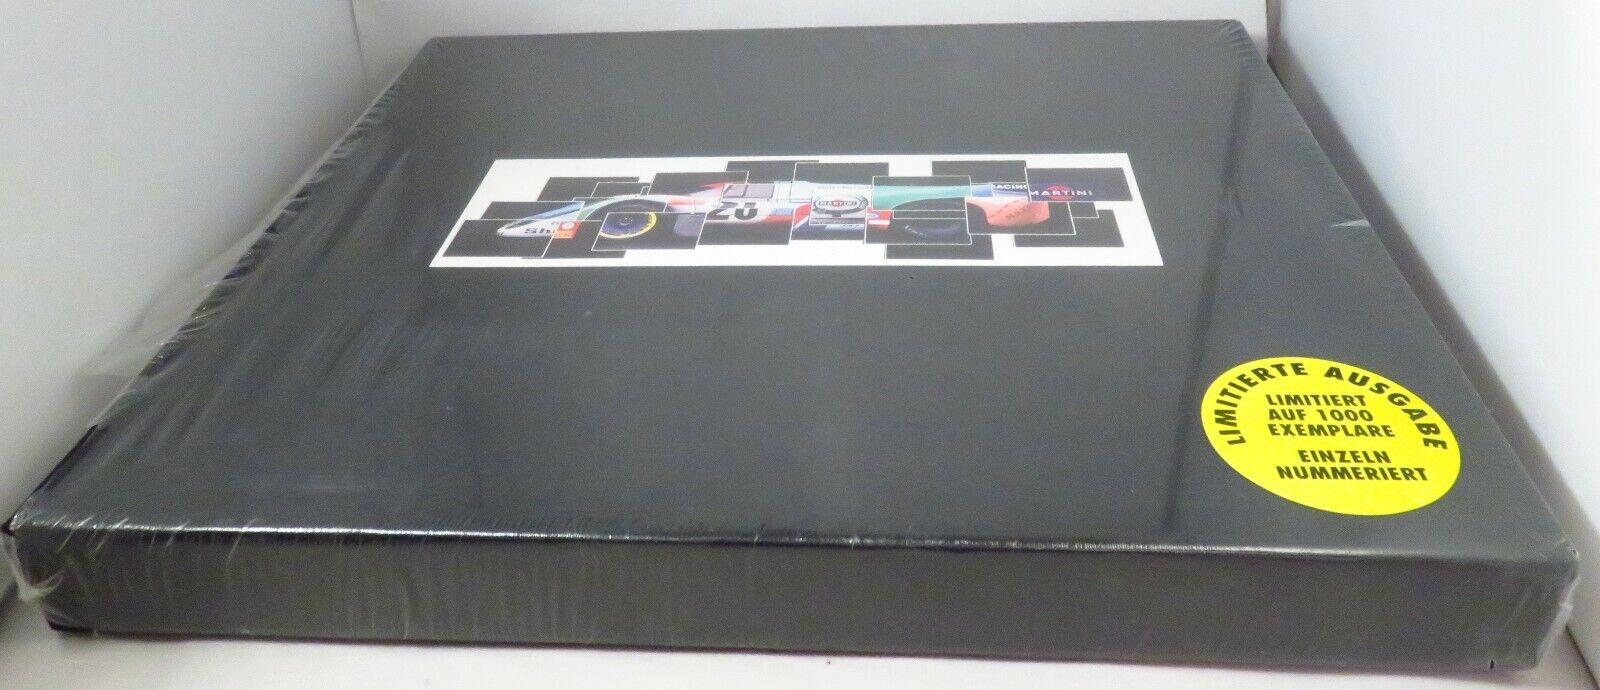 PORSCHE 917 x 17 Jeffrey Zwart Derek Bell Bell Bell HEEL German Luxury Photobook 943 1000 372